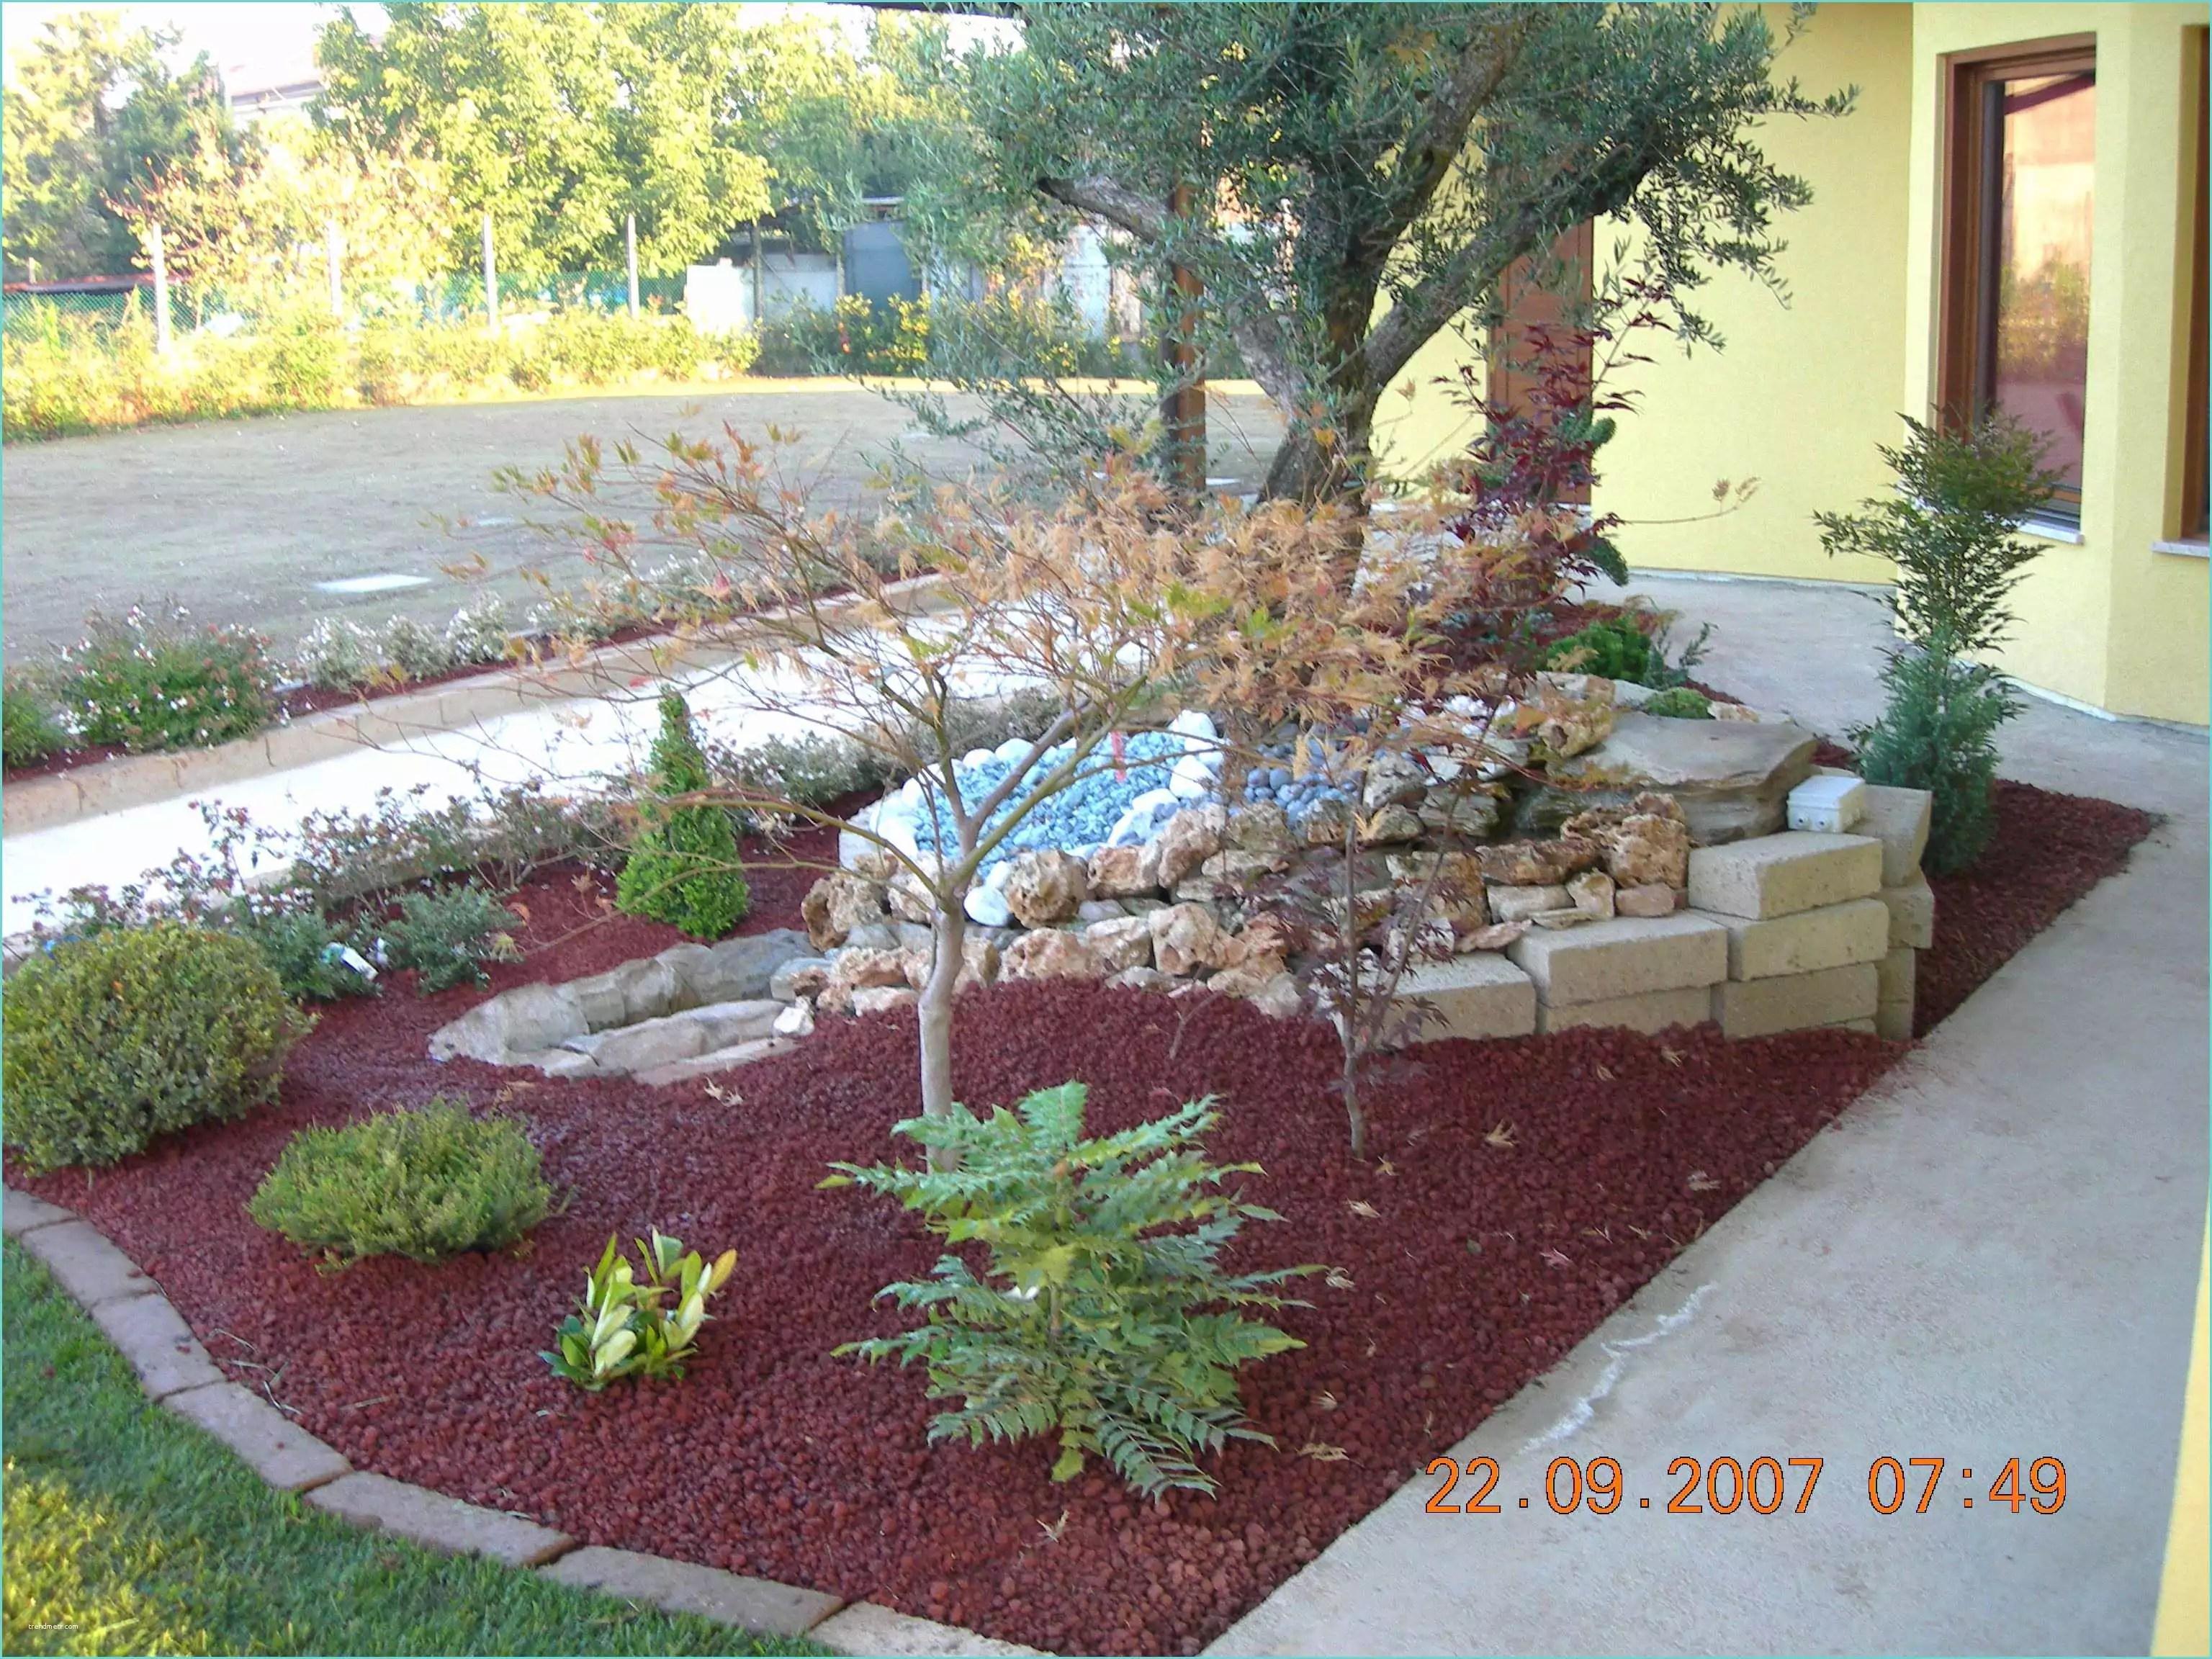 Idee Aiuole Giardino Con Sassi Idee Giardino Con Sassi 15 Fantastico Meravigliosa  Trendmetr